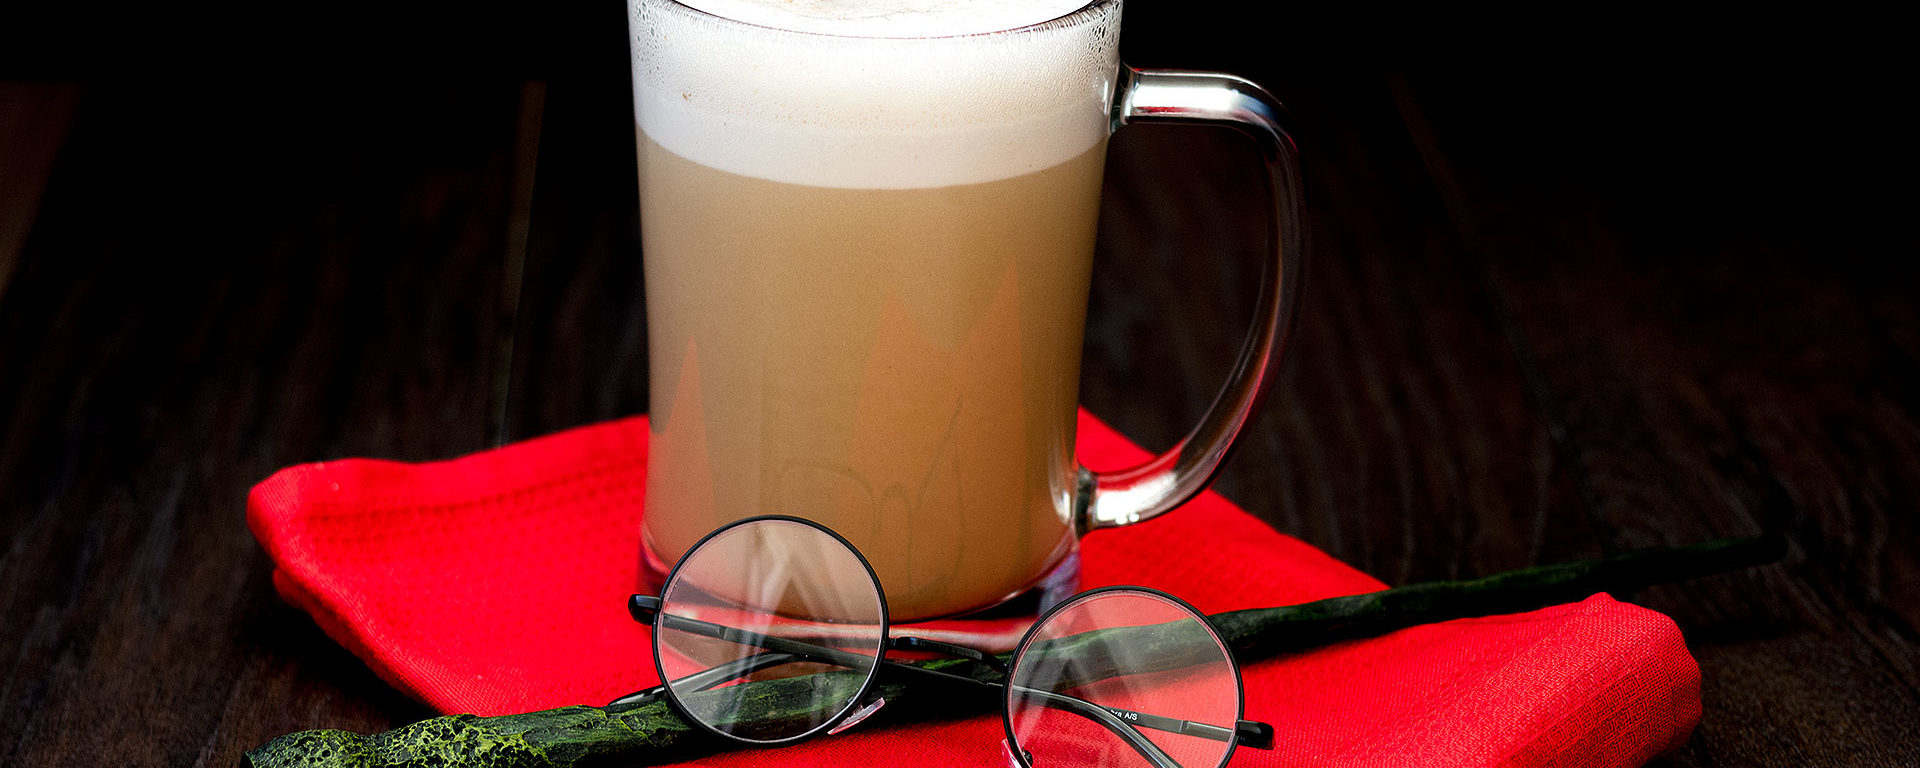 Piwo kremowe z alkoholem